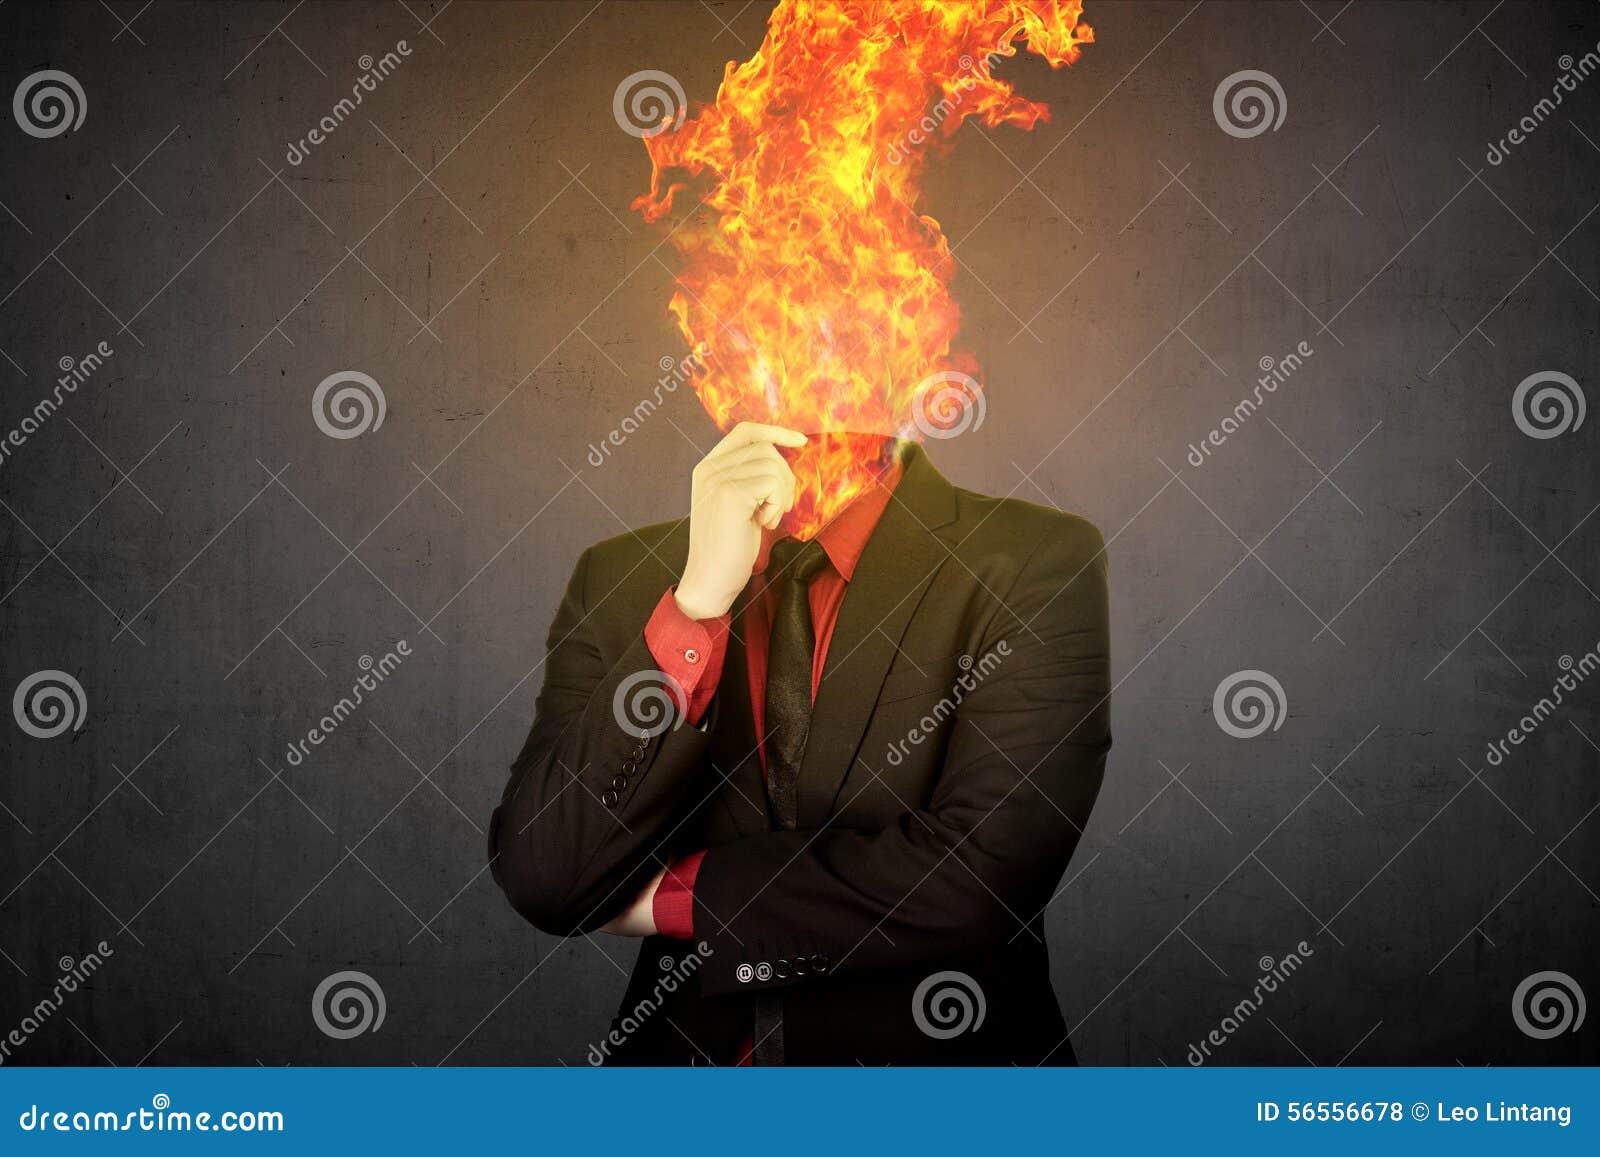 Download Επικεφαλής επιχειρησιακό άτομο πυρκαγιάς Απεικόνιση αποθεμάτων - εικονογραφία από περίεργα, κίνδυνος: 56556678